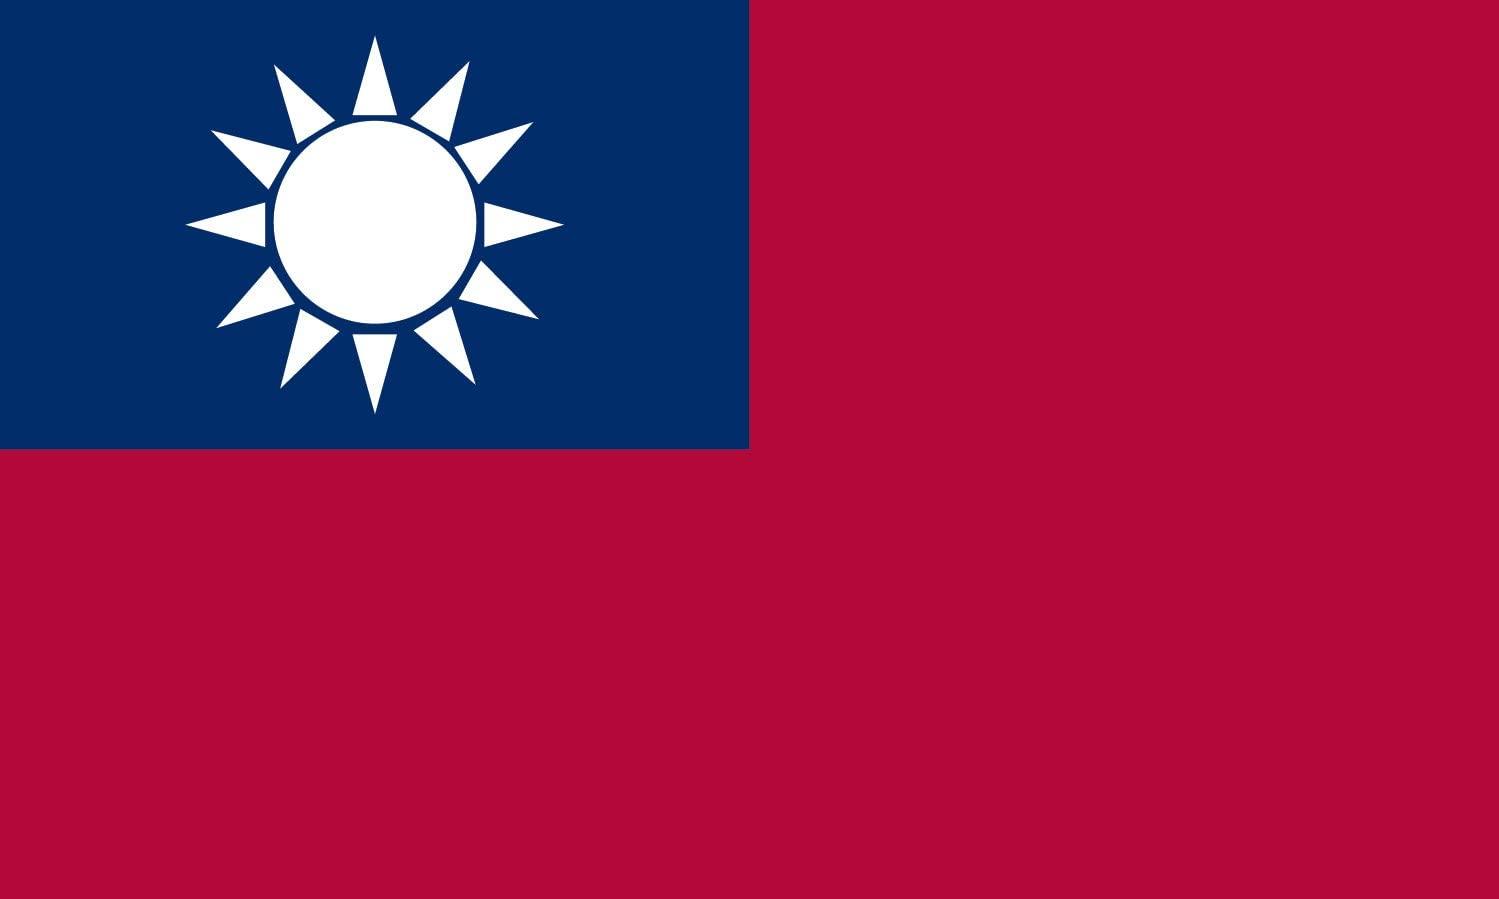 Prediksi Togel Taiwan Sabtu 25 September 2021